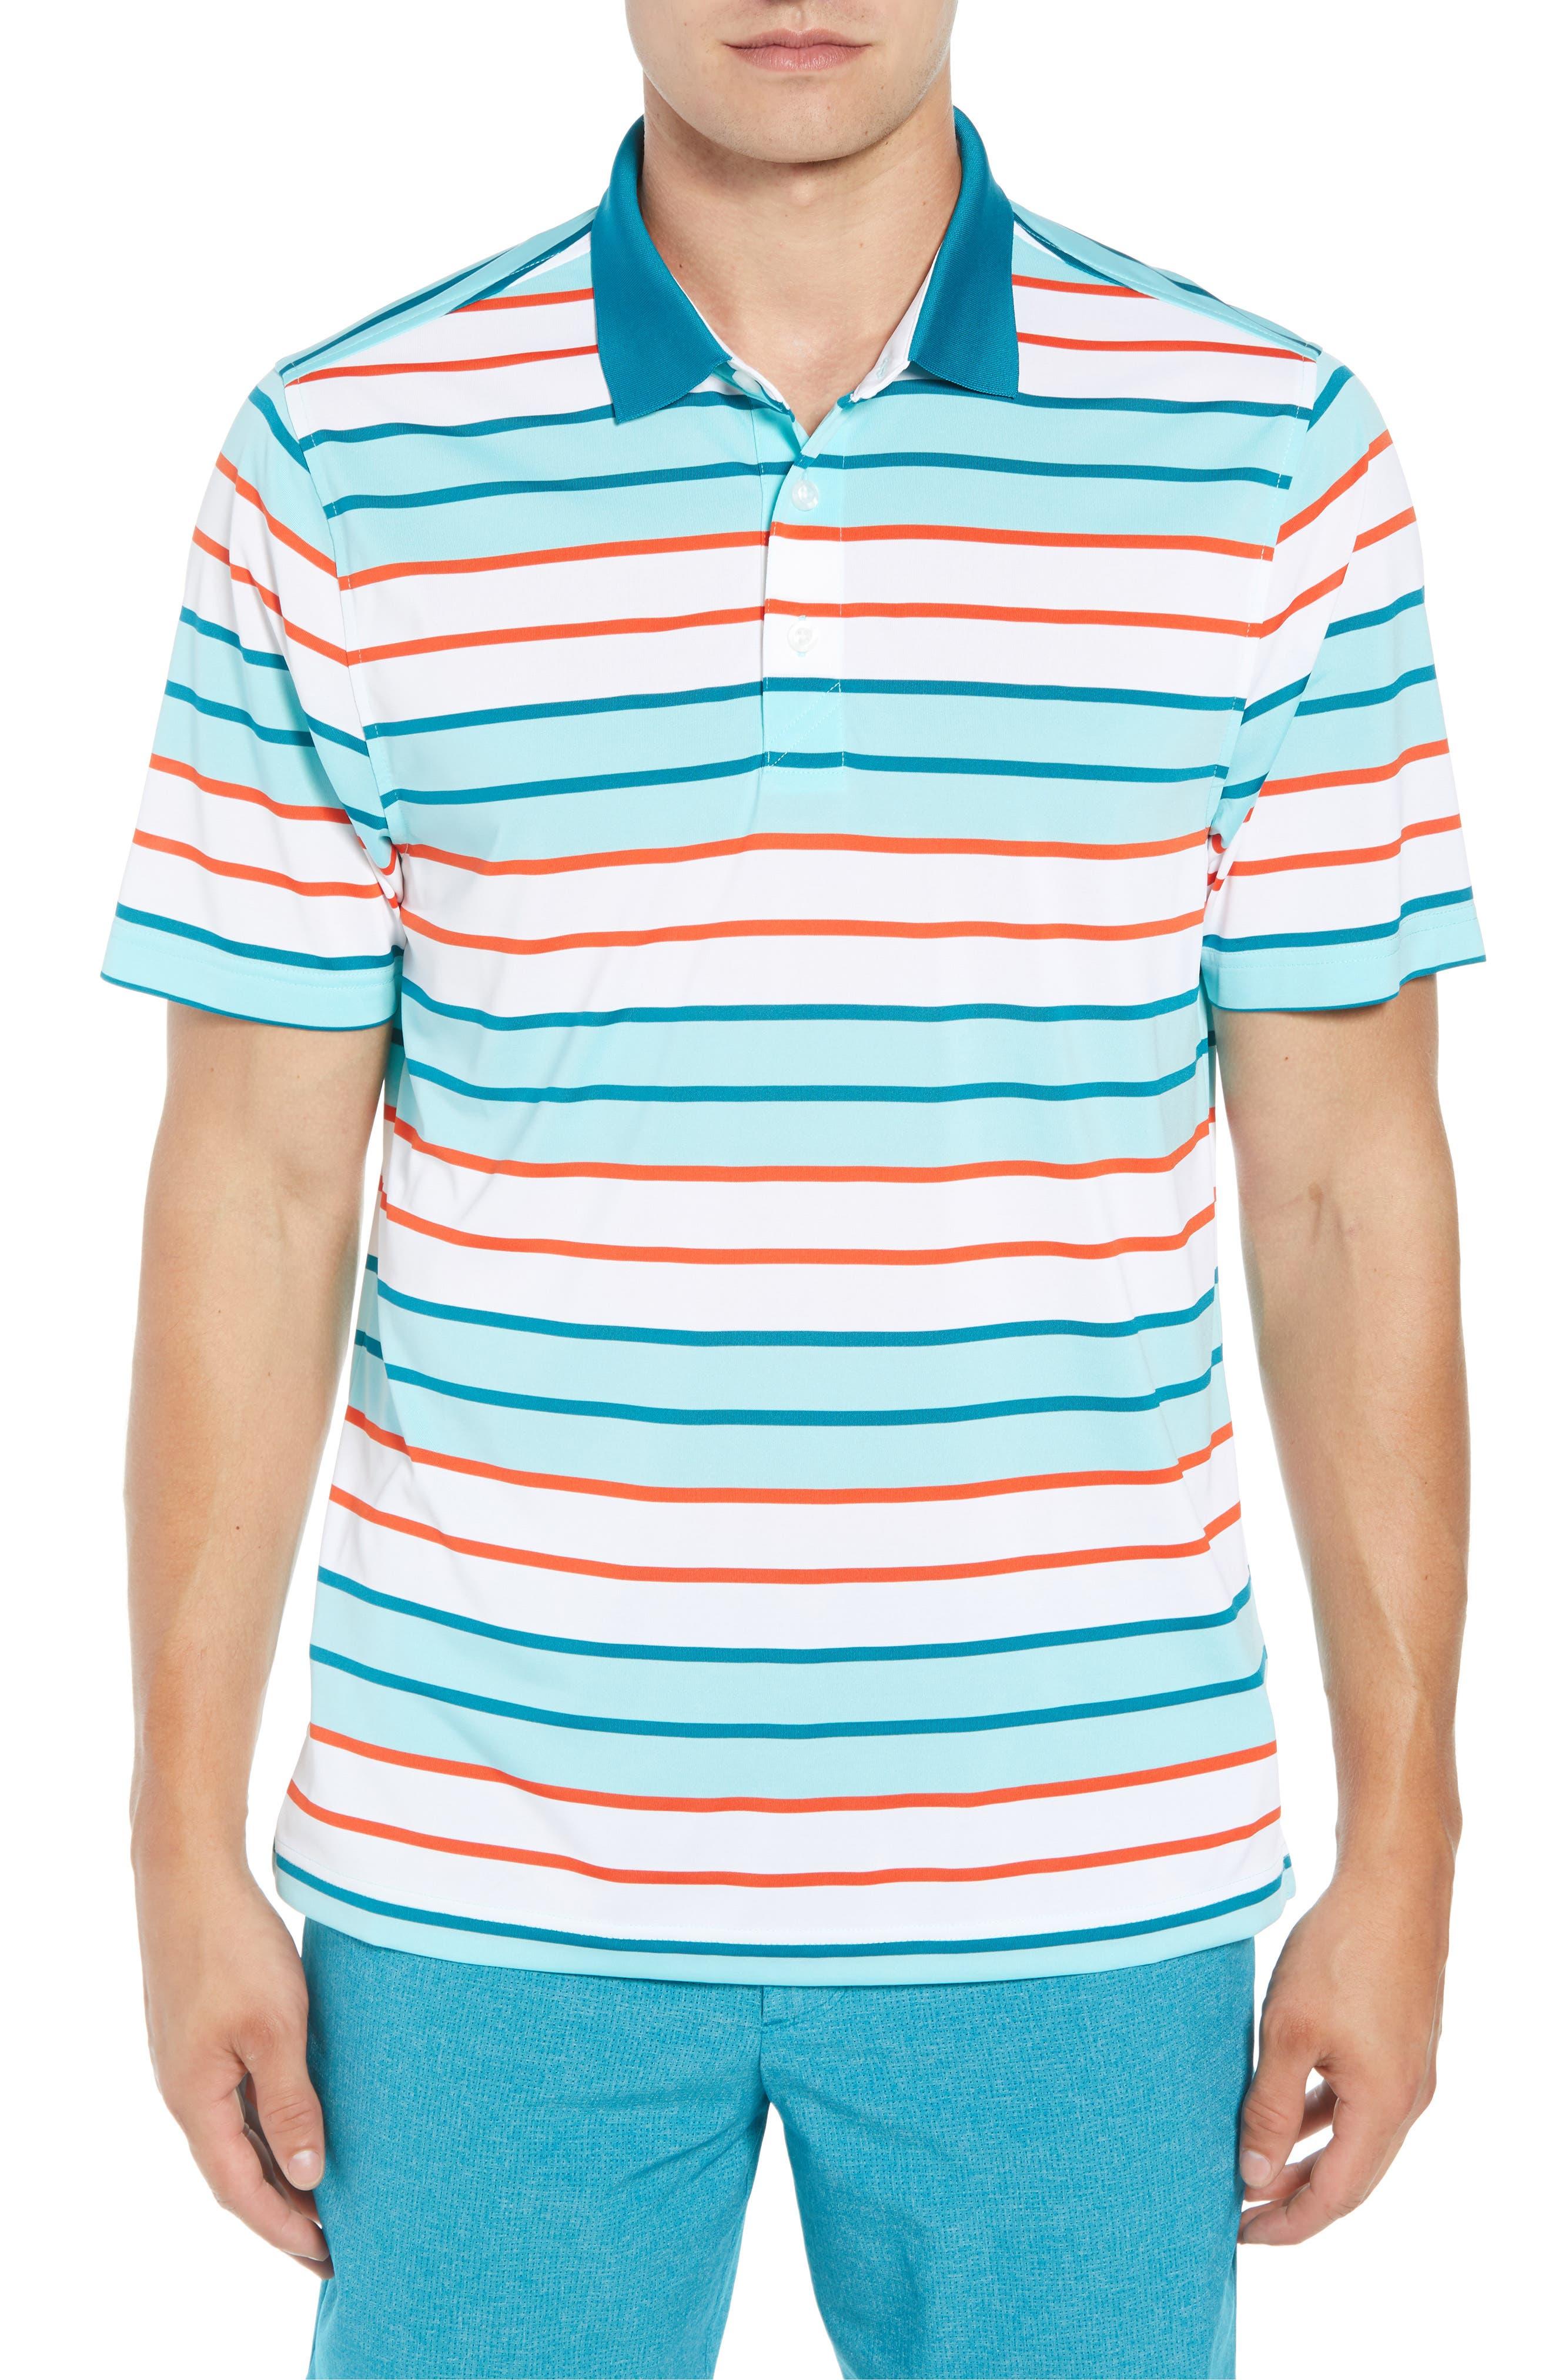 Cody DryTec Striped Polo,                             Main thumbnail 1, color,                             AQUATIC